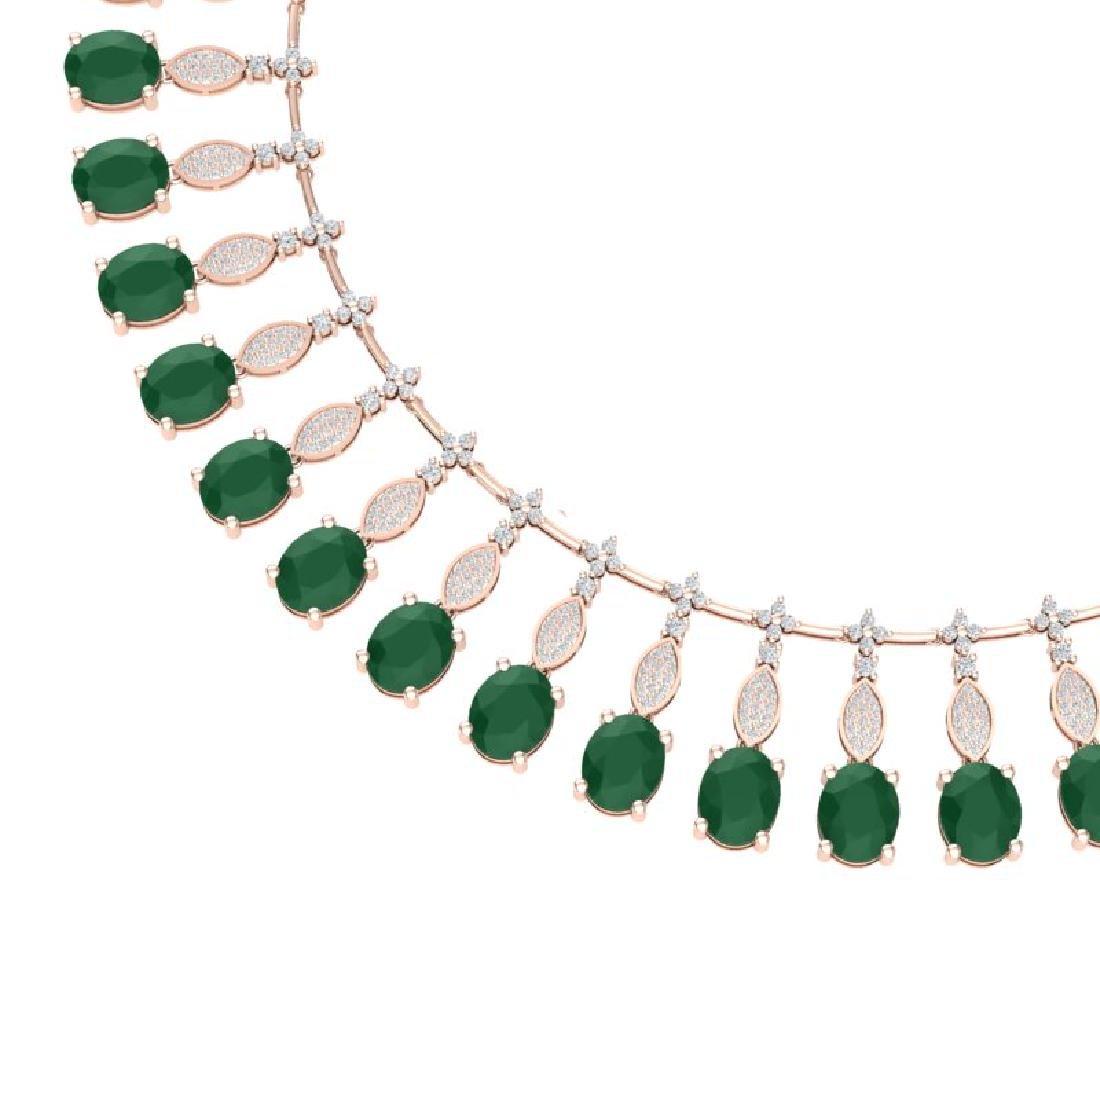 65.62 CTW Royalty Emerald & VS Diamond Necklace 18K